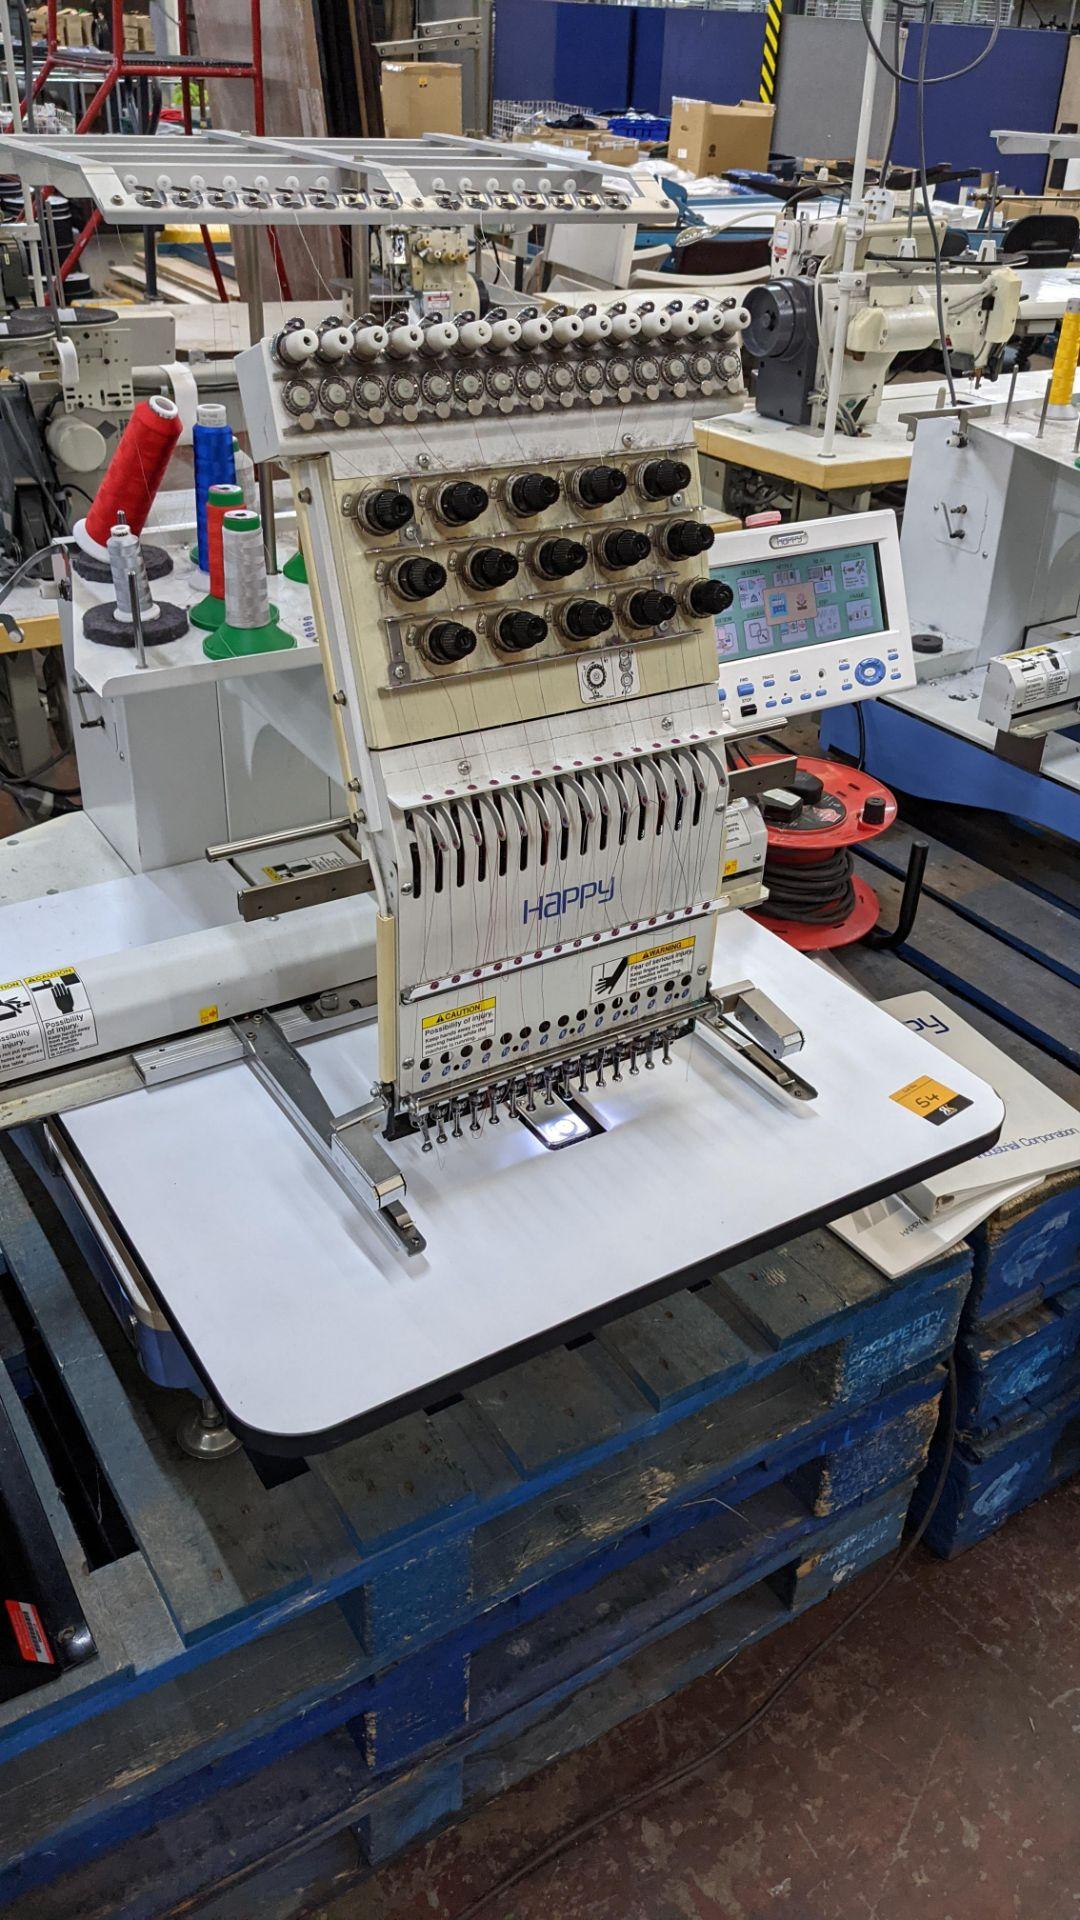 Happy single head embroidery machine model HCD-1501-40 - Image 9 of 22